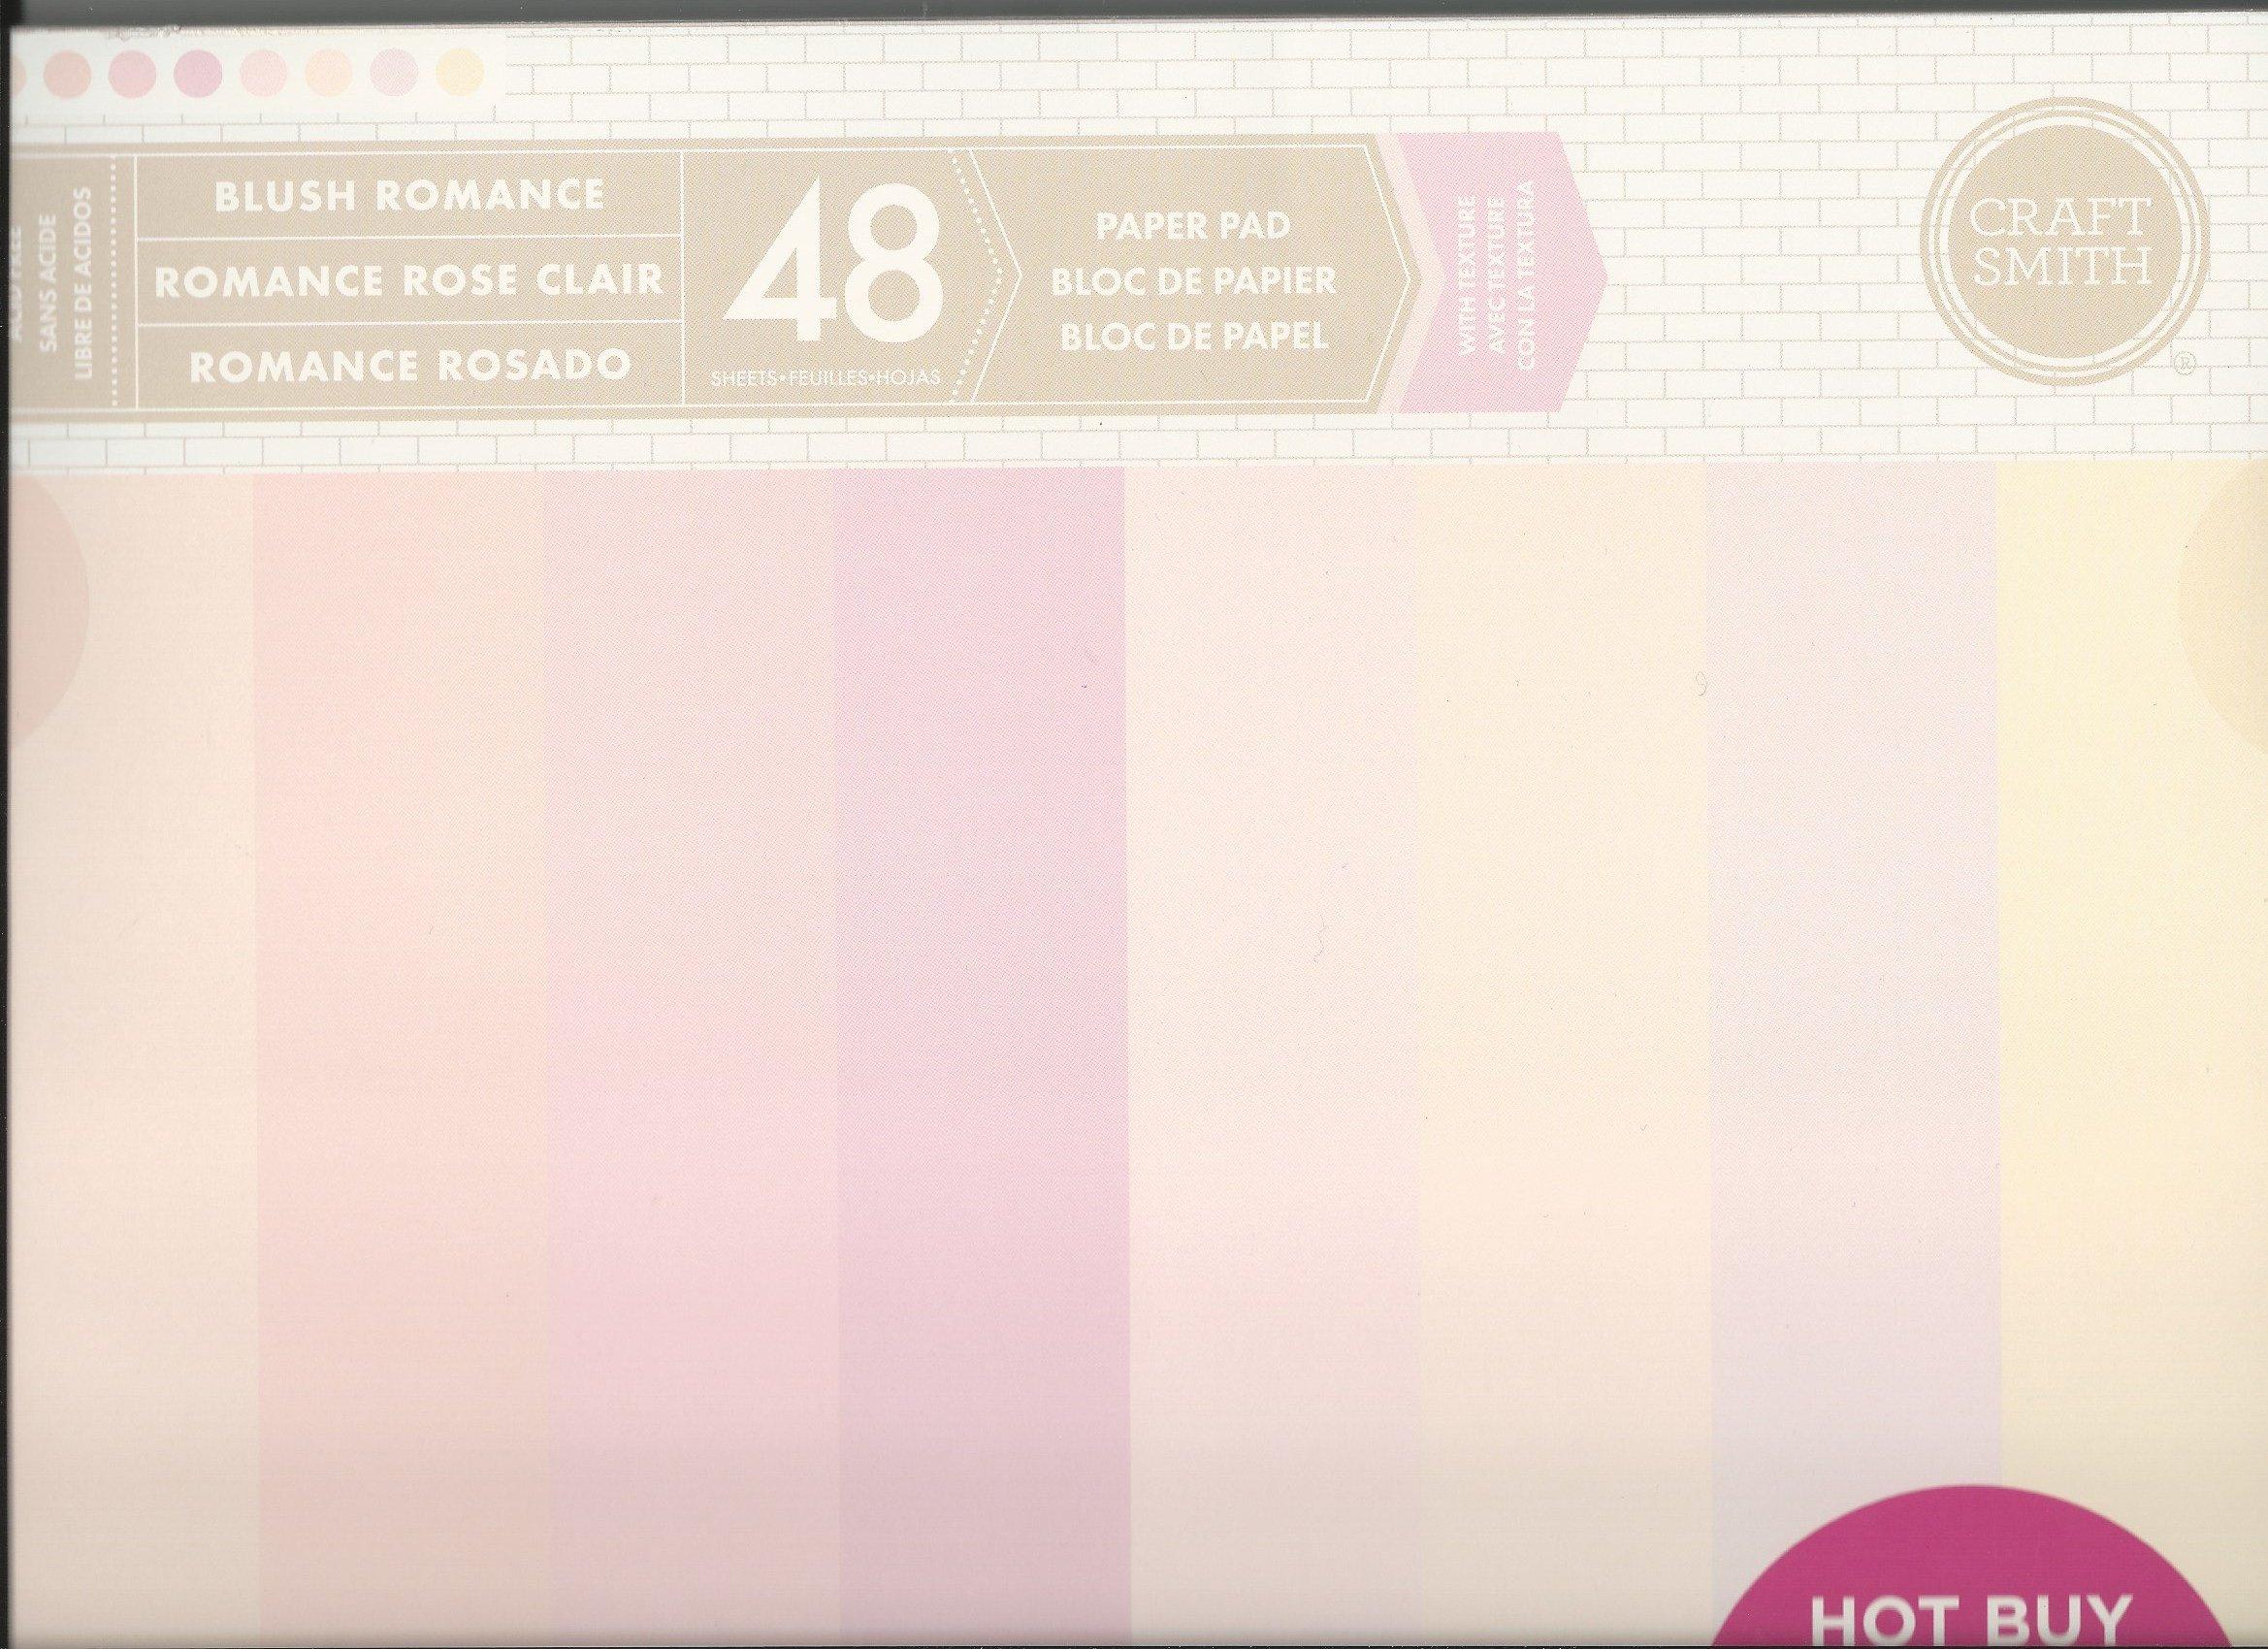 Craft Smith 12 x 12 Blush Romance Wedding Neutral Paper Pad